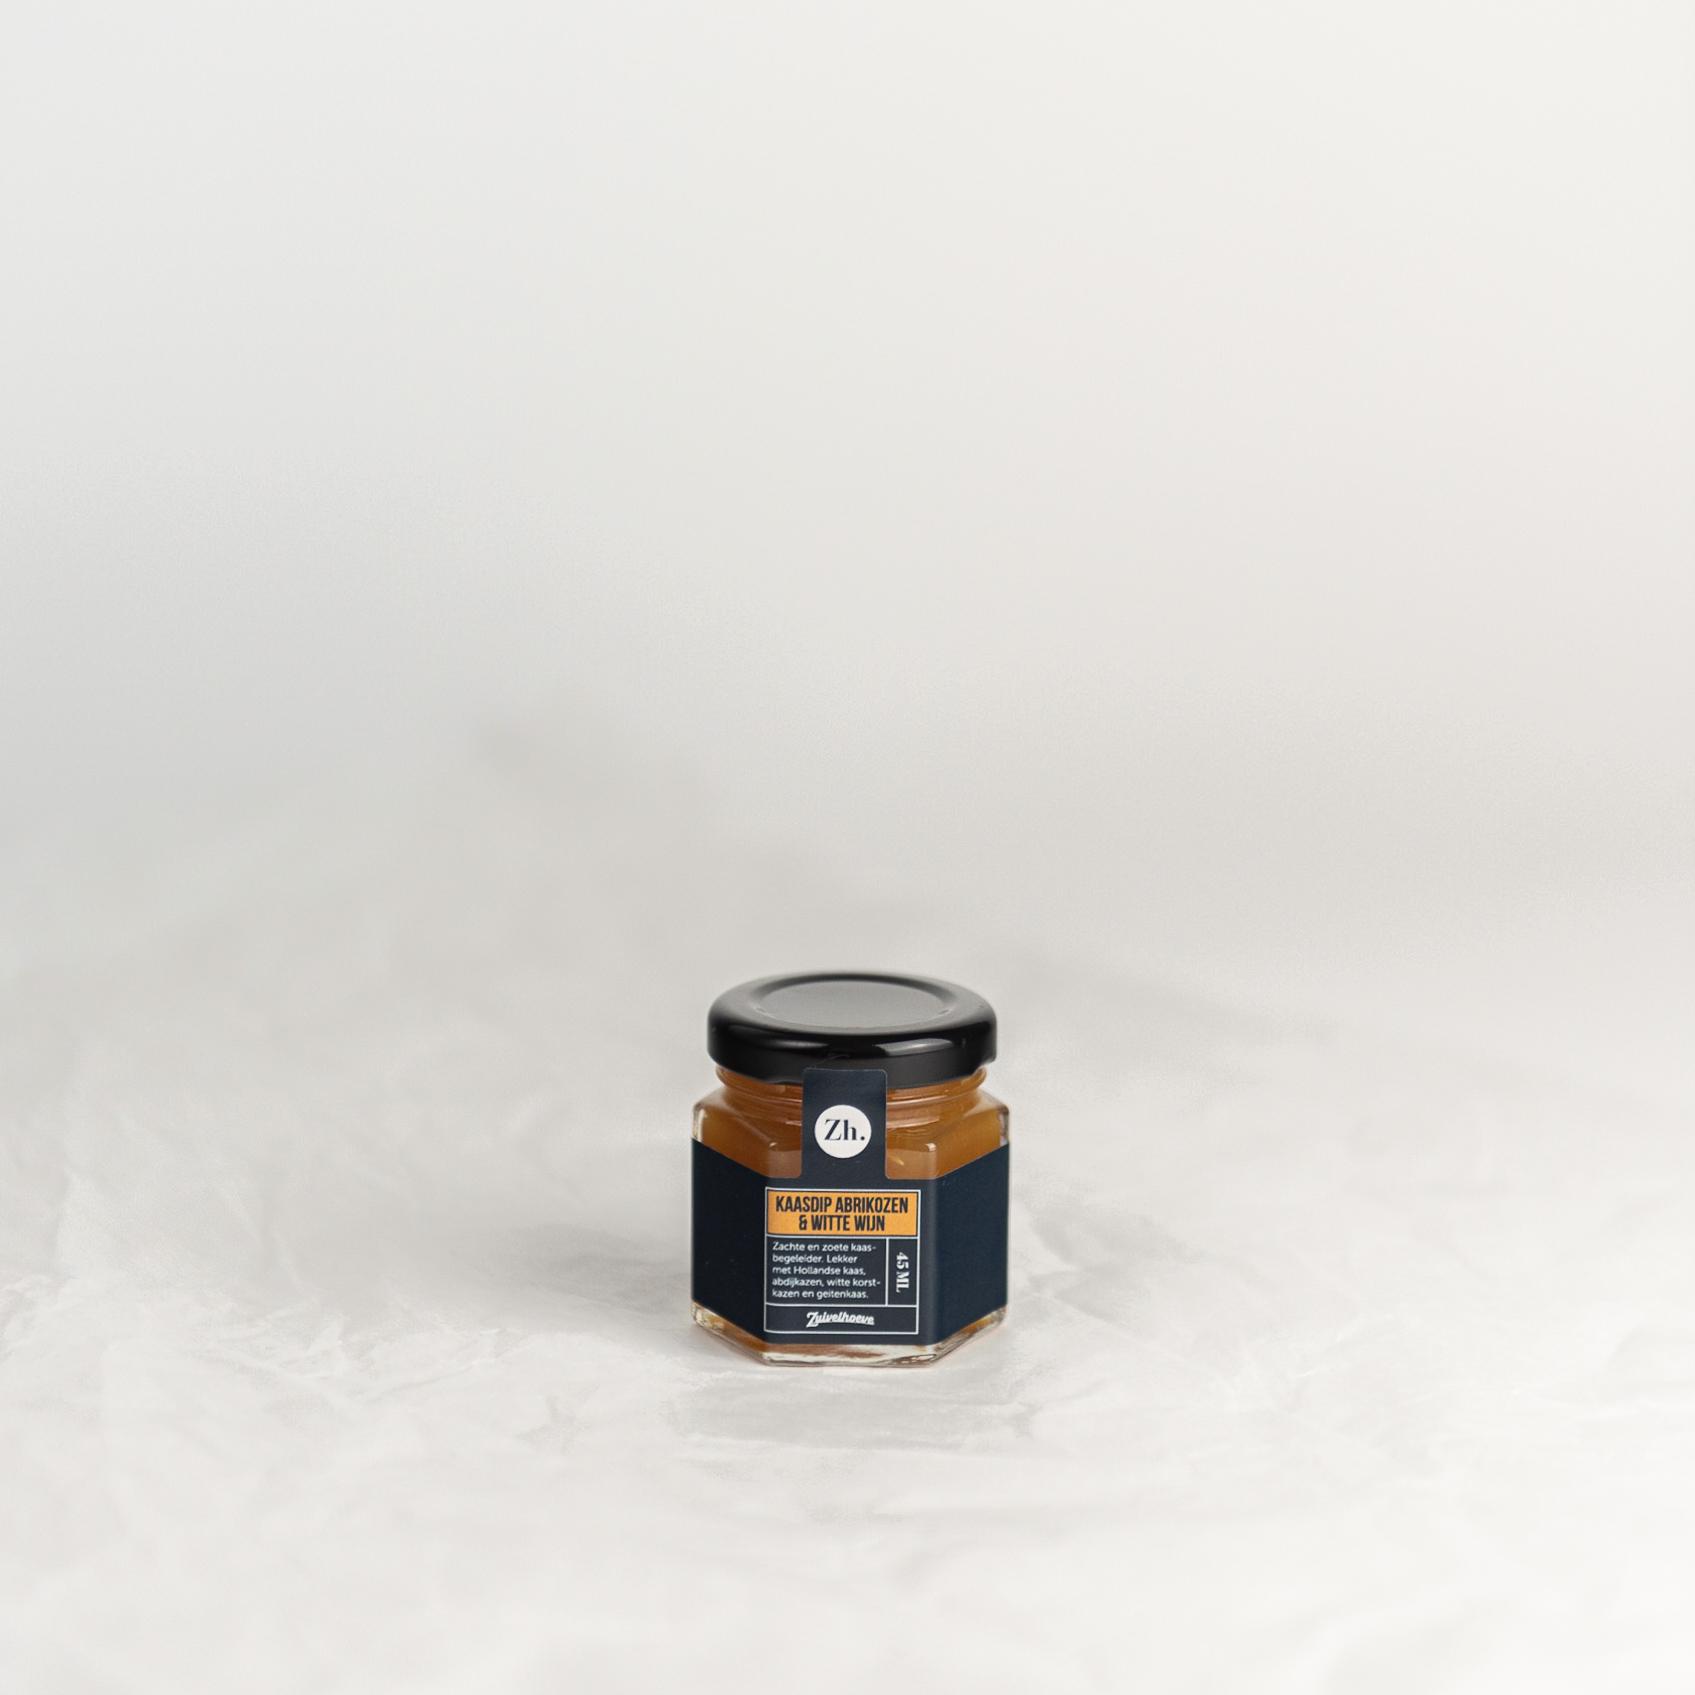 Kaasdip mini | Abrikoos & Witte wijn